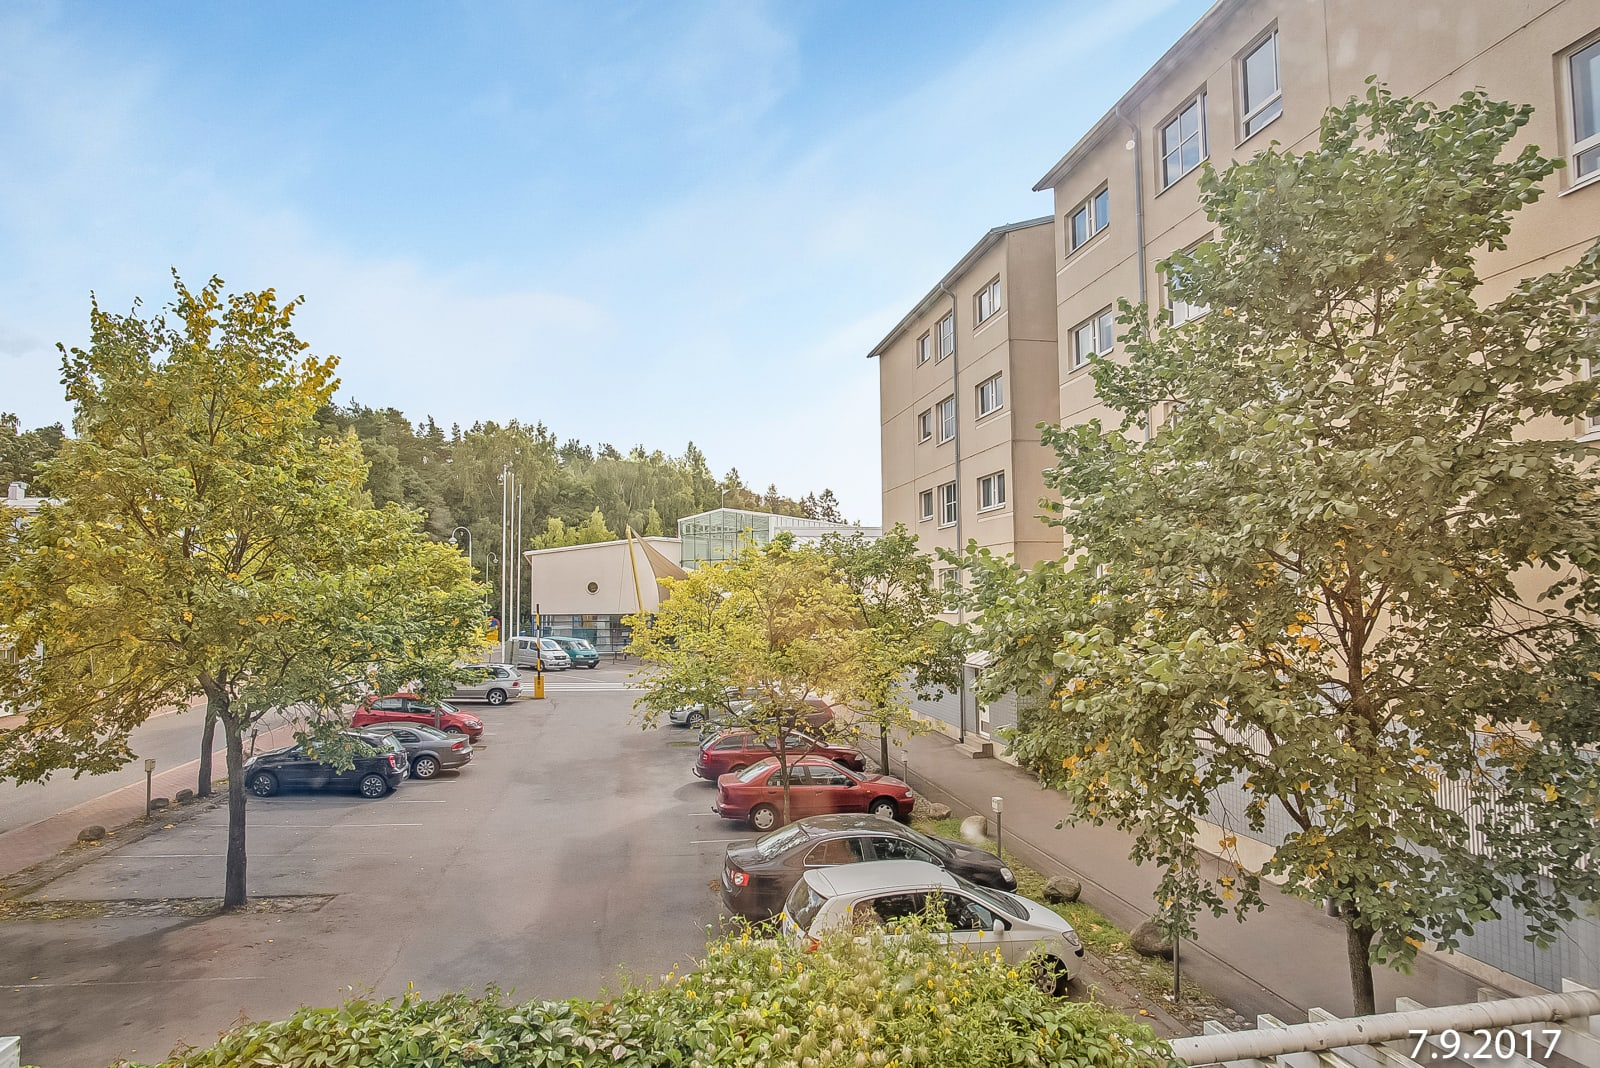 Helsinki, Pikku Huopalahti, Tilkankatu 15